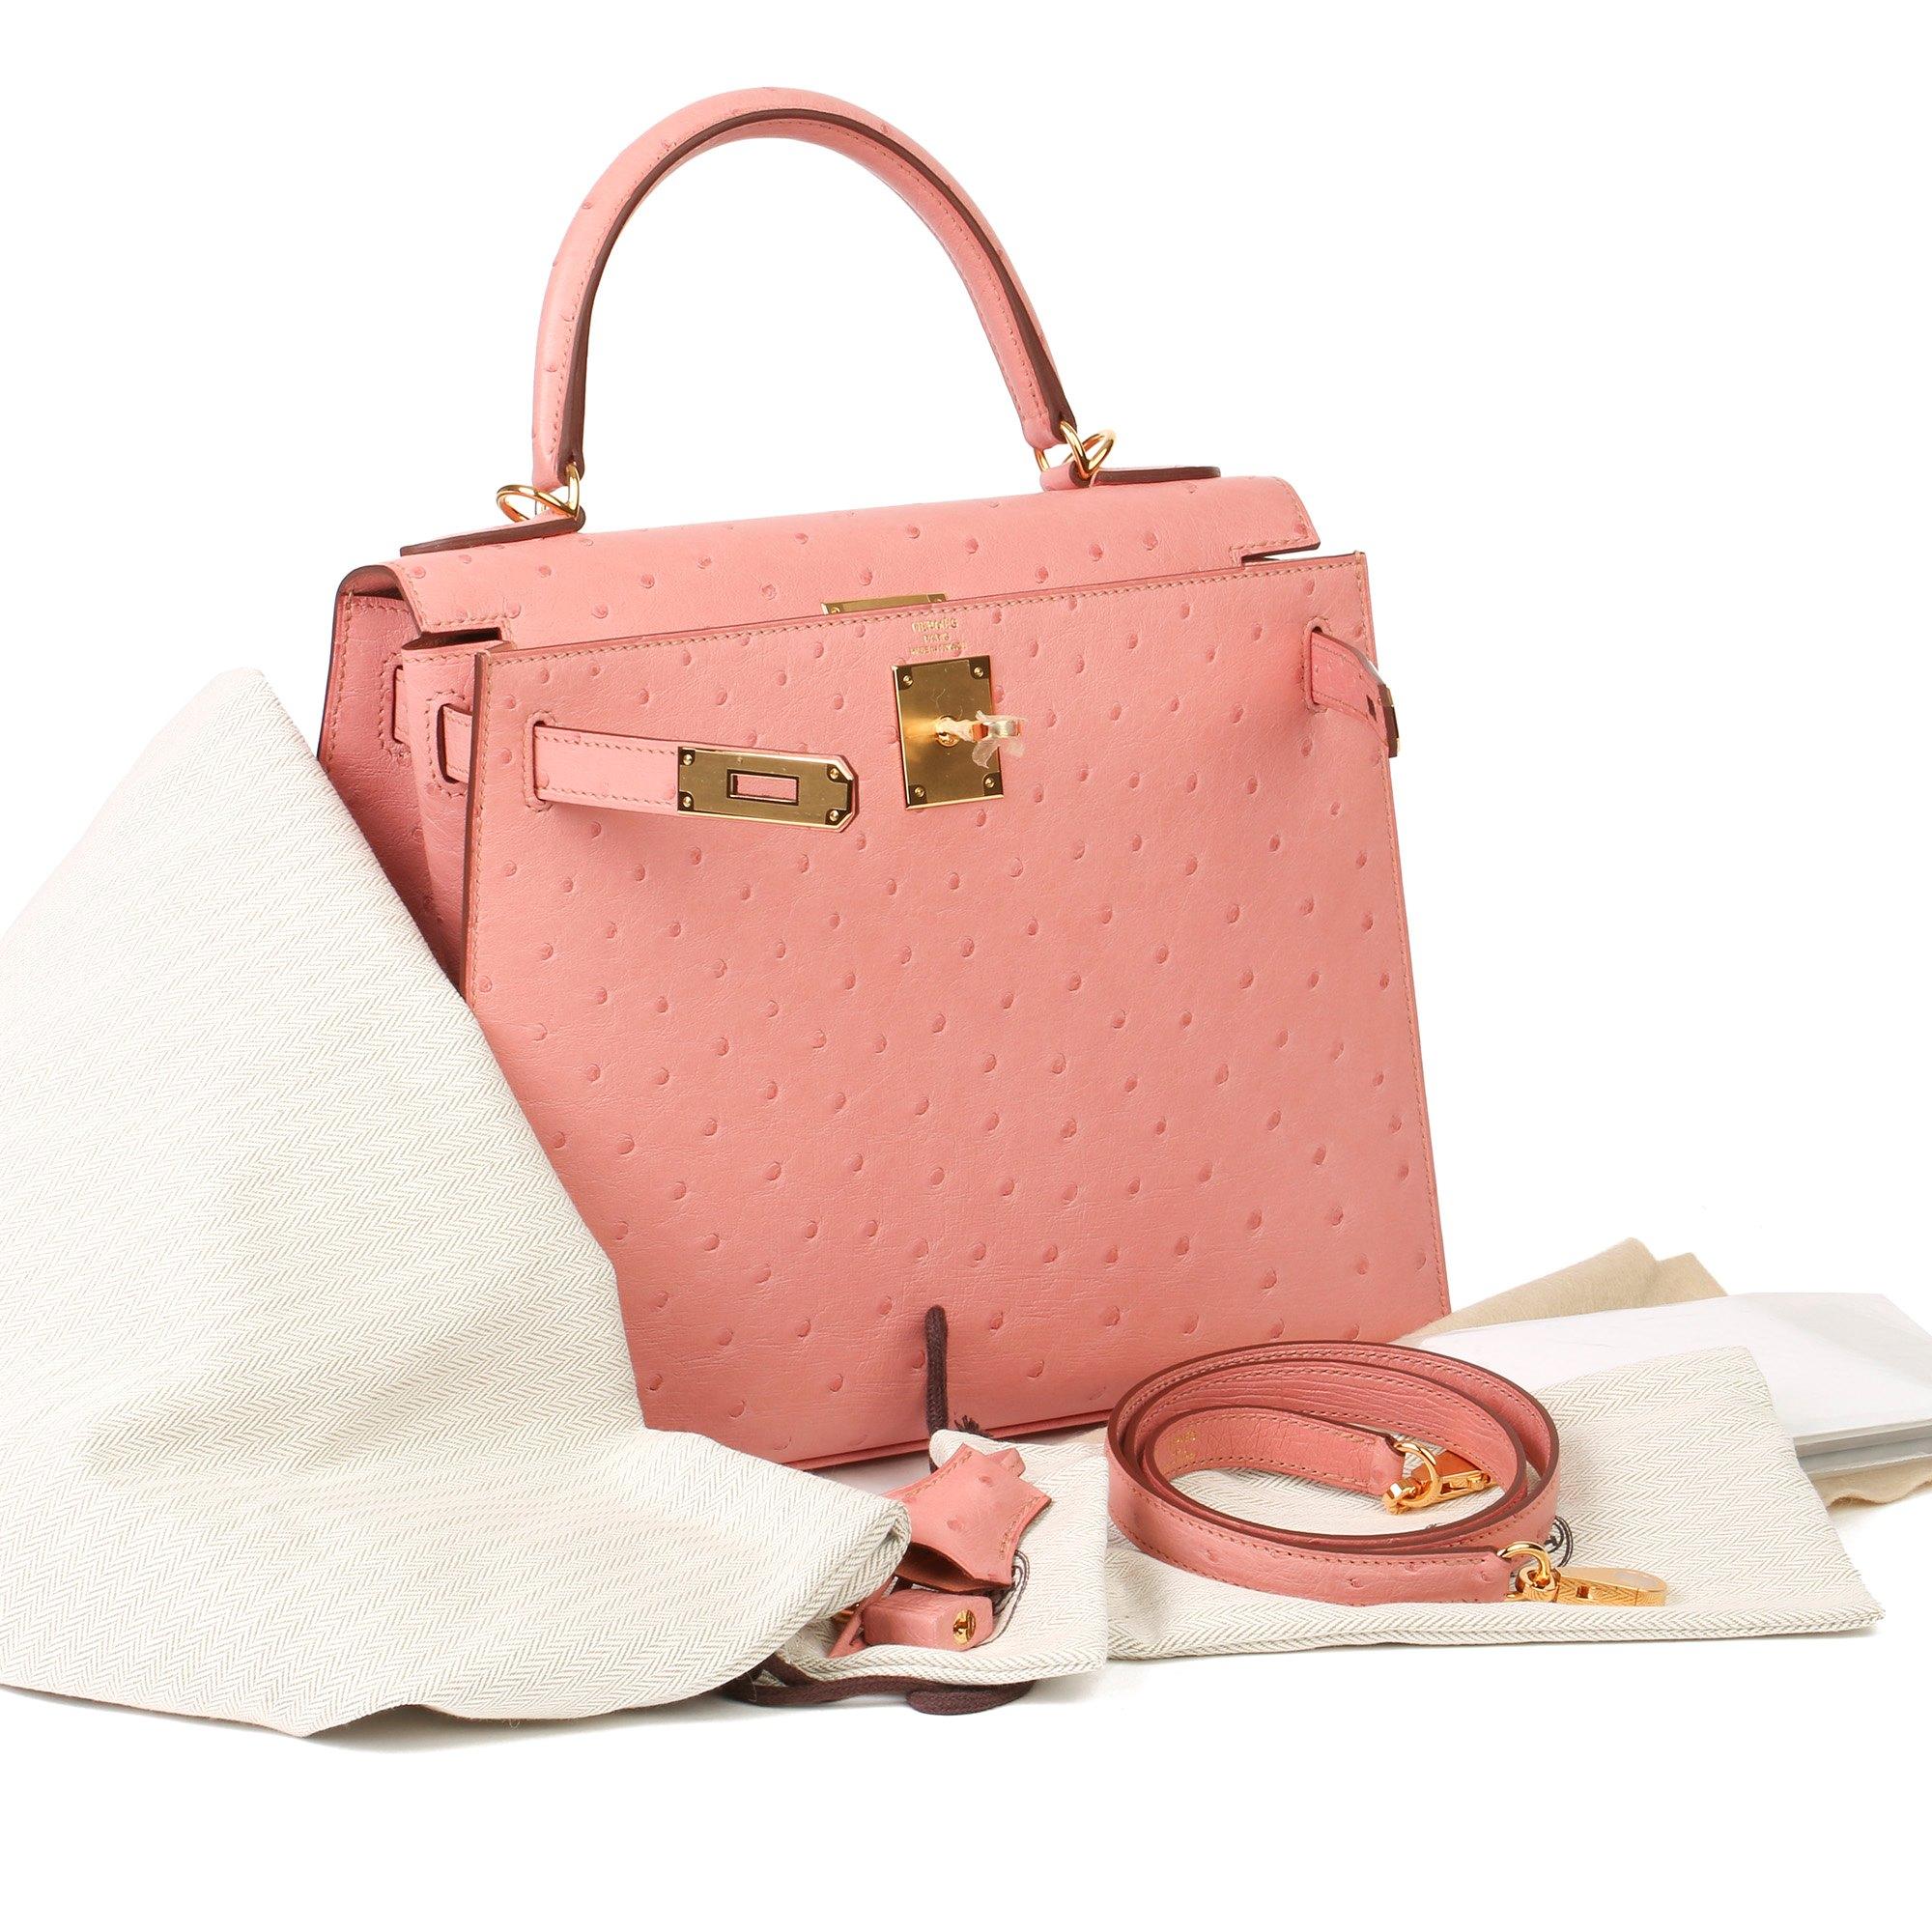 Hermès Terre Cuite Ostrich Leather Kelly 28cm Sellier